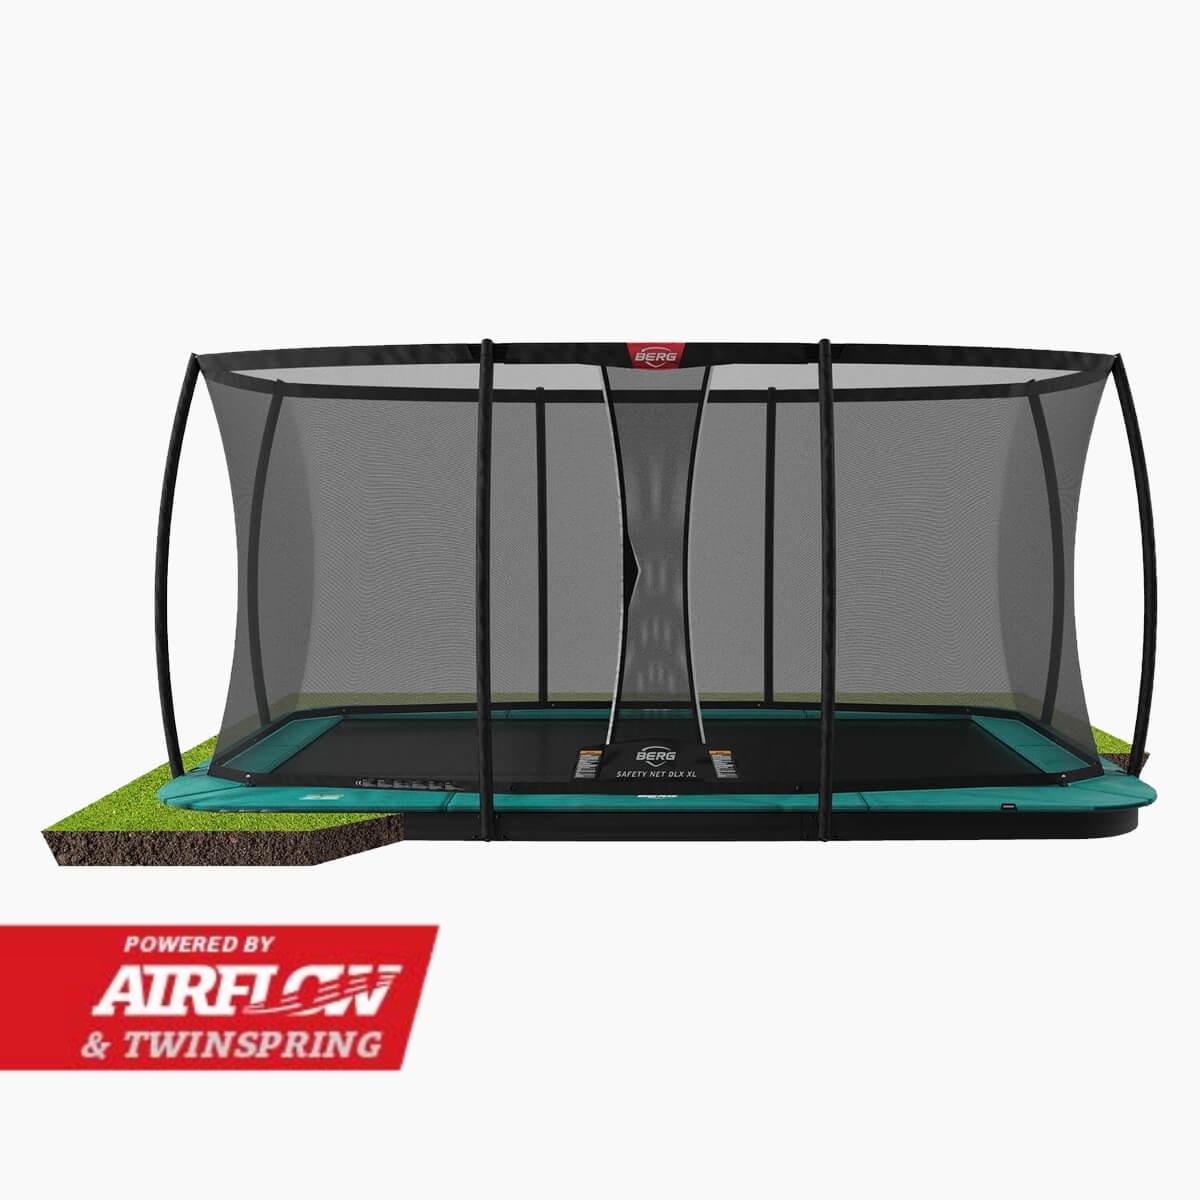 BERG Champion FlatGround with safety net trampoline